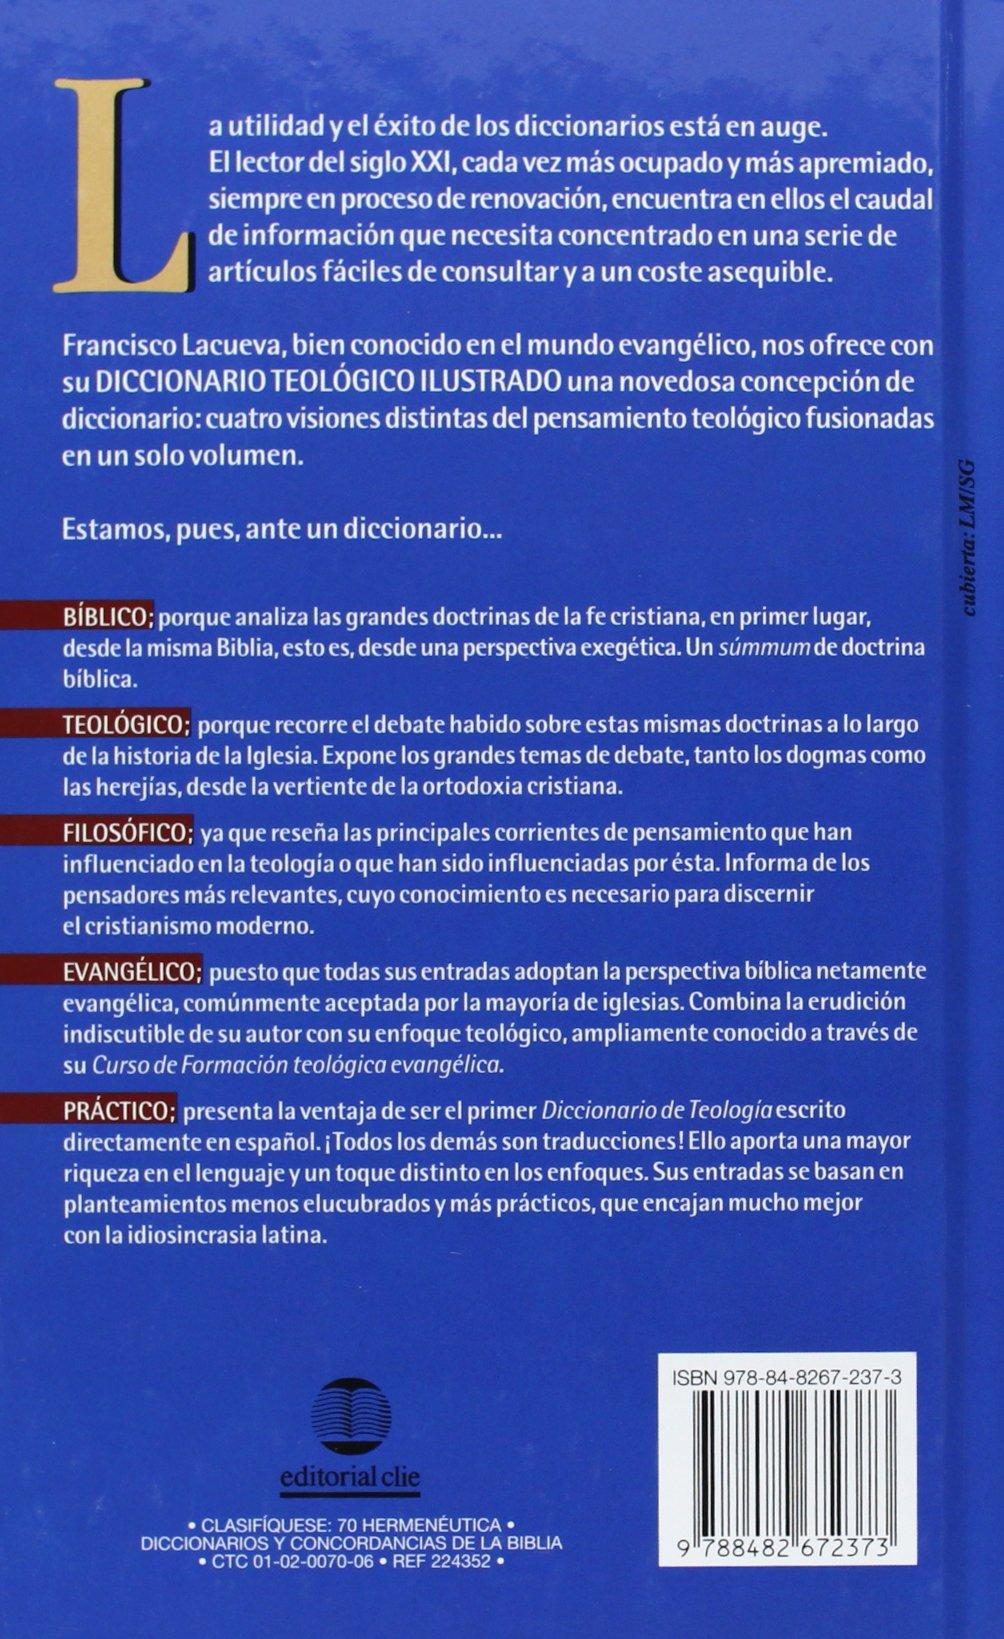 Diccionario teológico ilustrado (Spanish Edition): Francisco Lacueva:  9788482672373: Amazon.com: Books